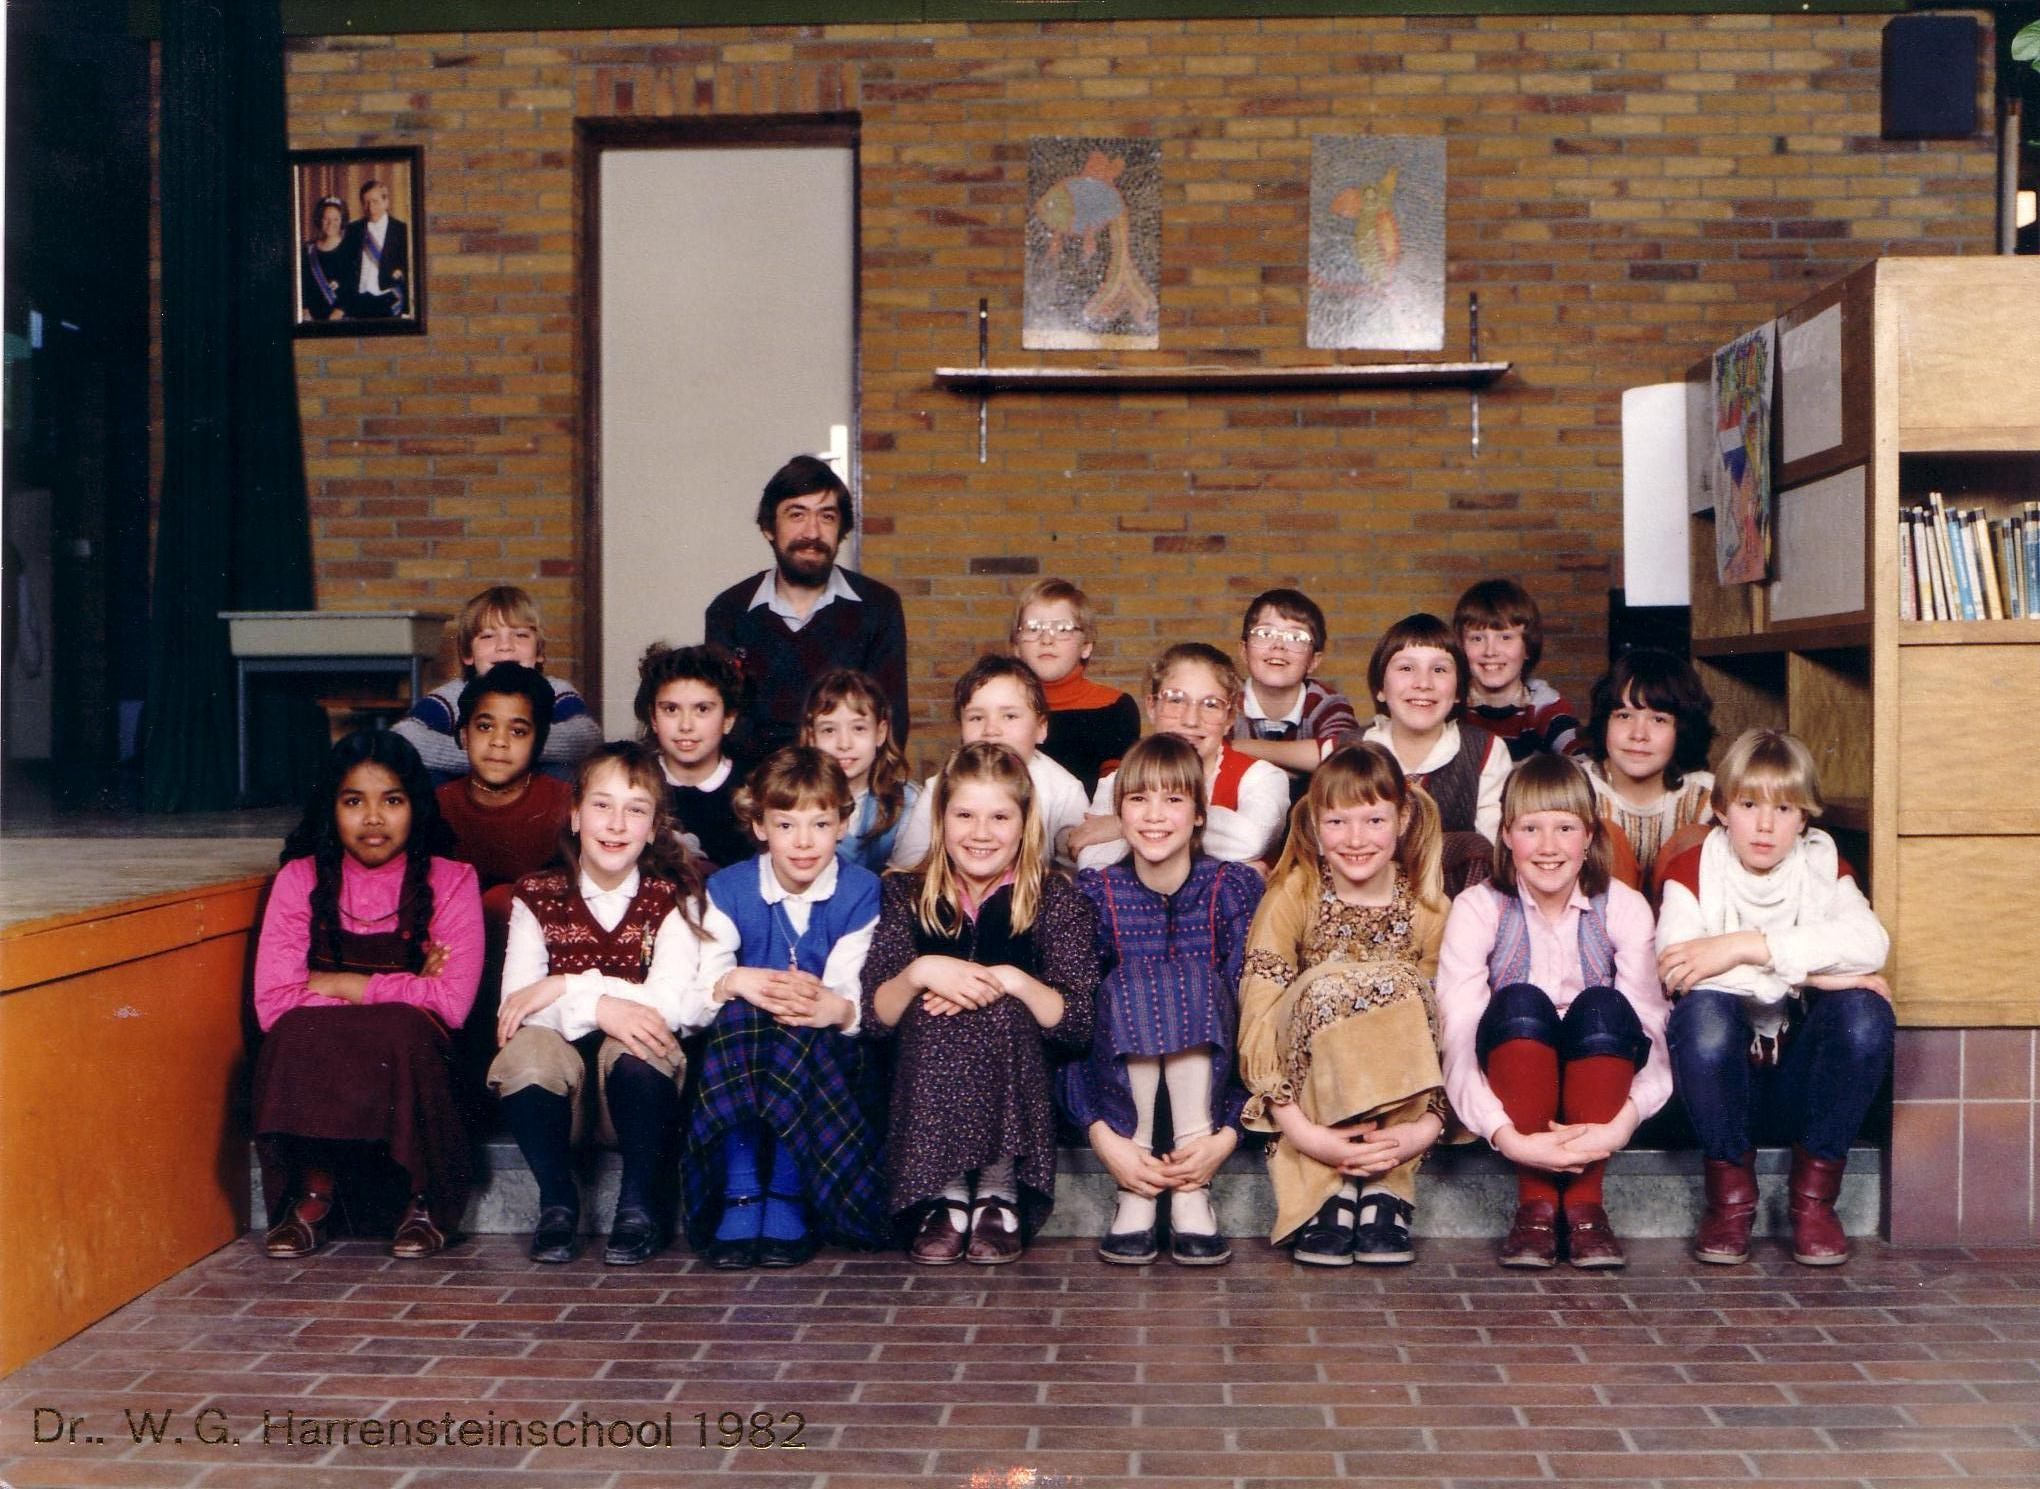 Dr. W.G. Harrensteinschool foto